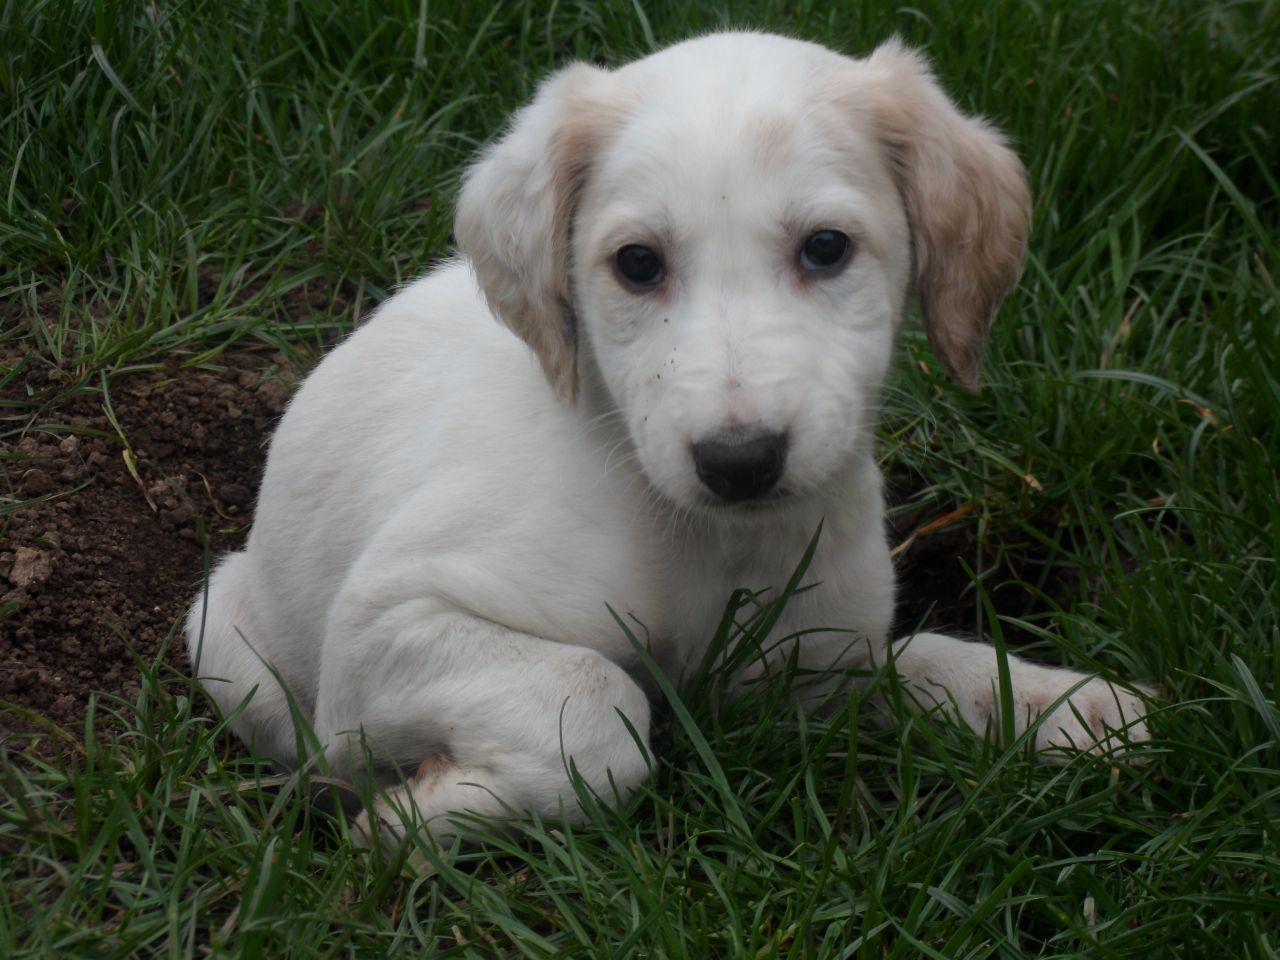 Saluki Puppies: Saluki Saluki Greyhound X Saluki Puppies Boston Breed